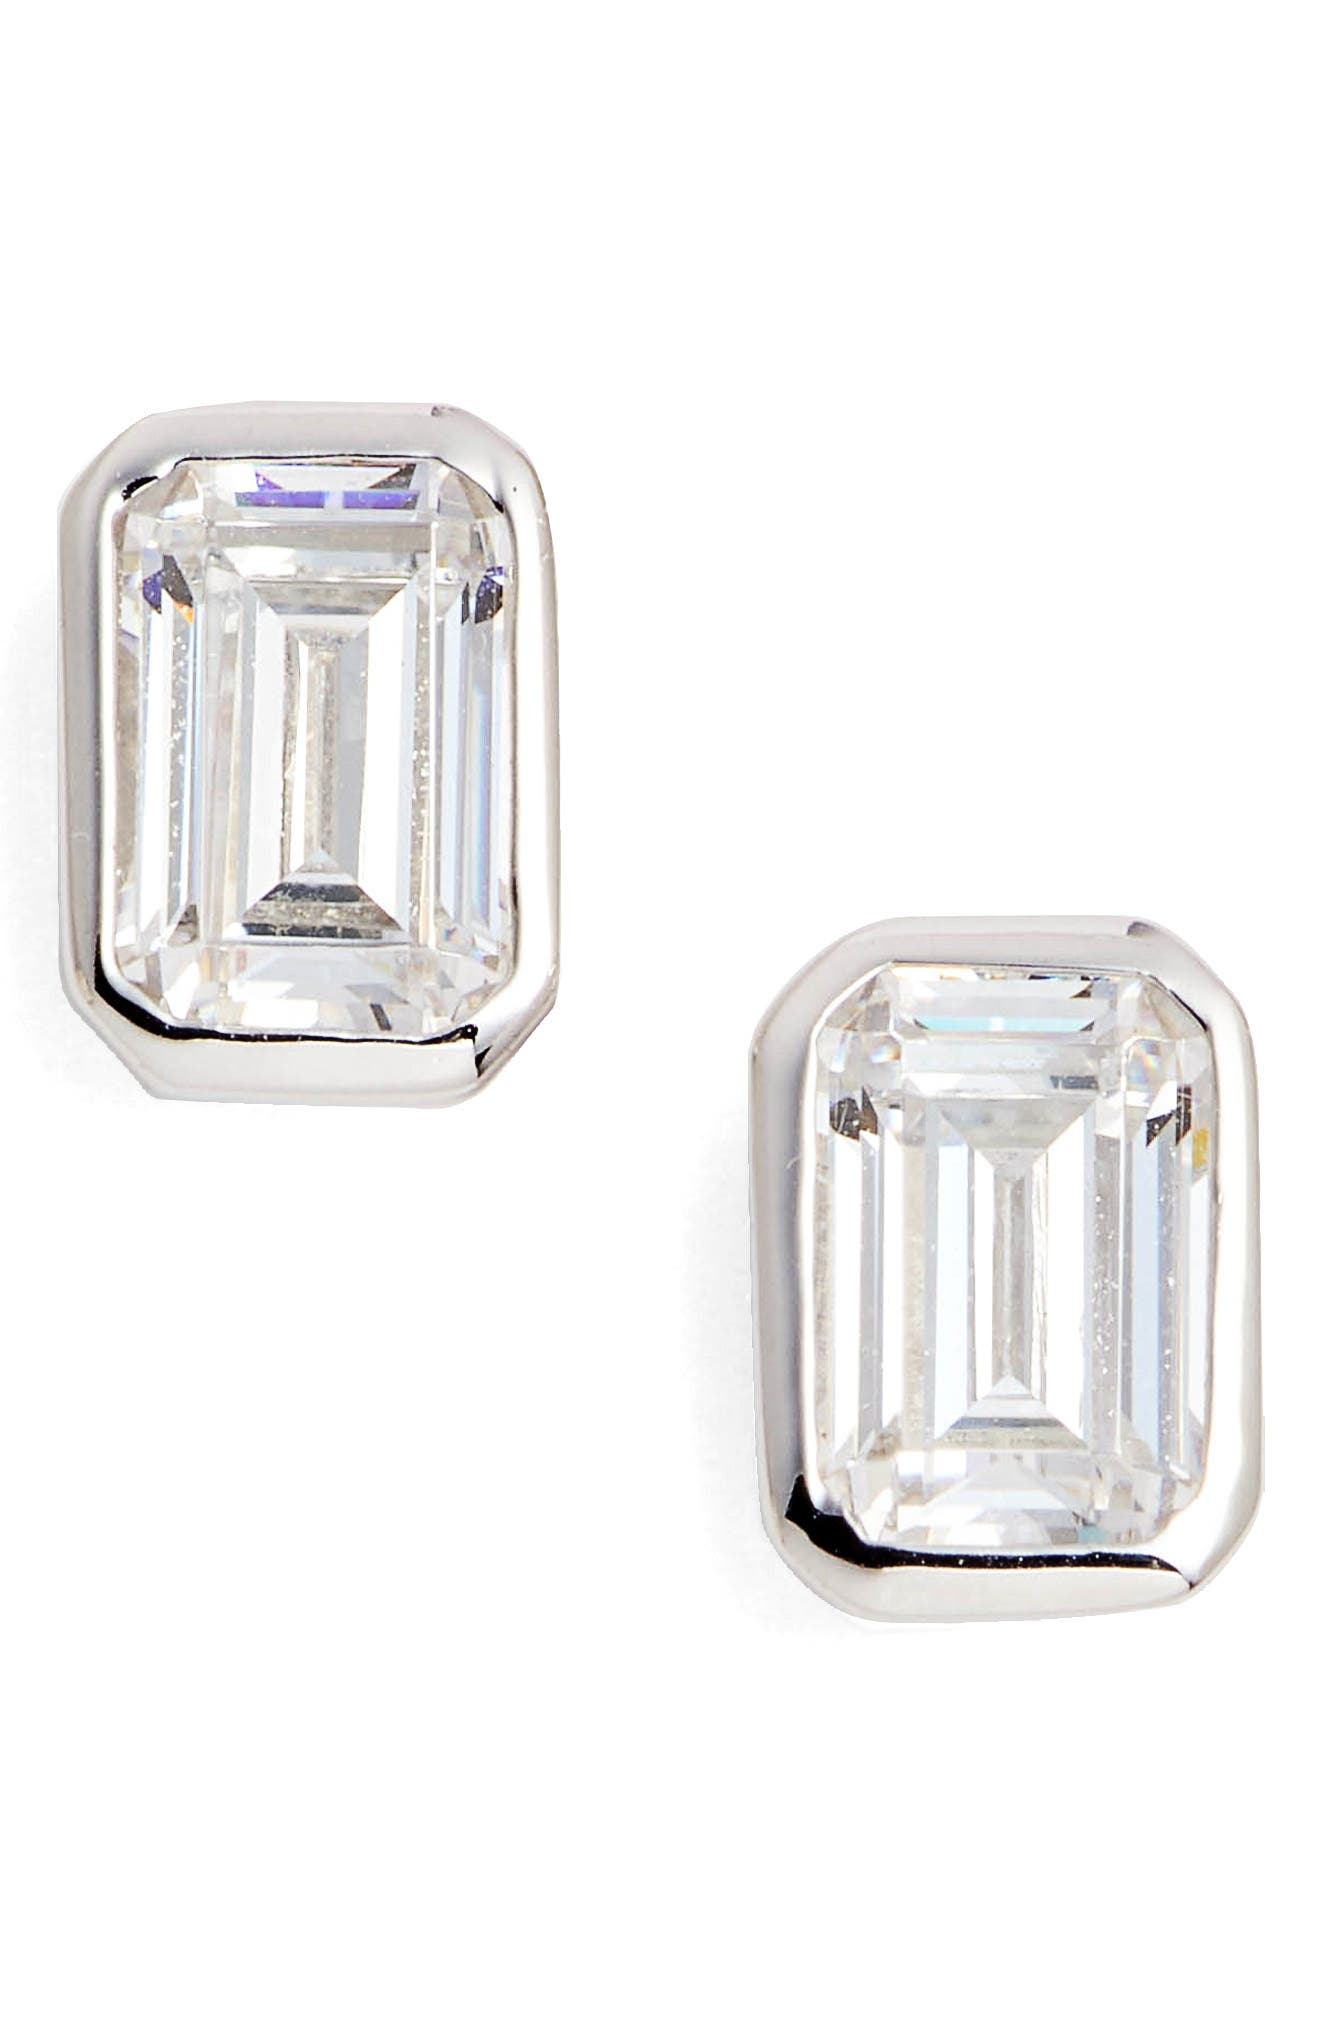 Bezel-Set Emerald Cut Stud Earrings,                             Main thumbnail 1, color,                             Silver/ Clear